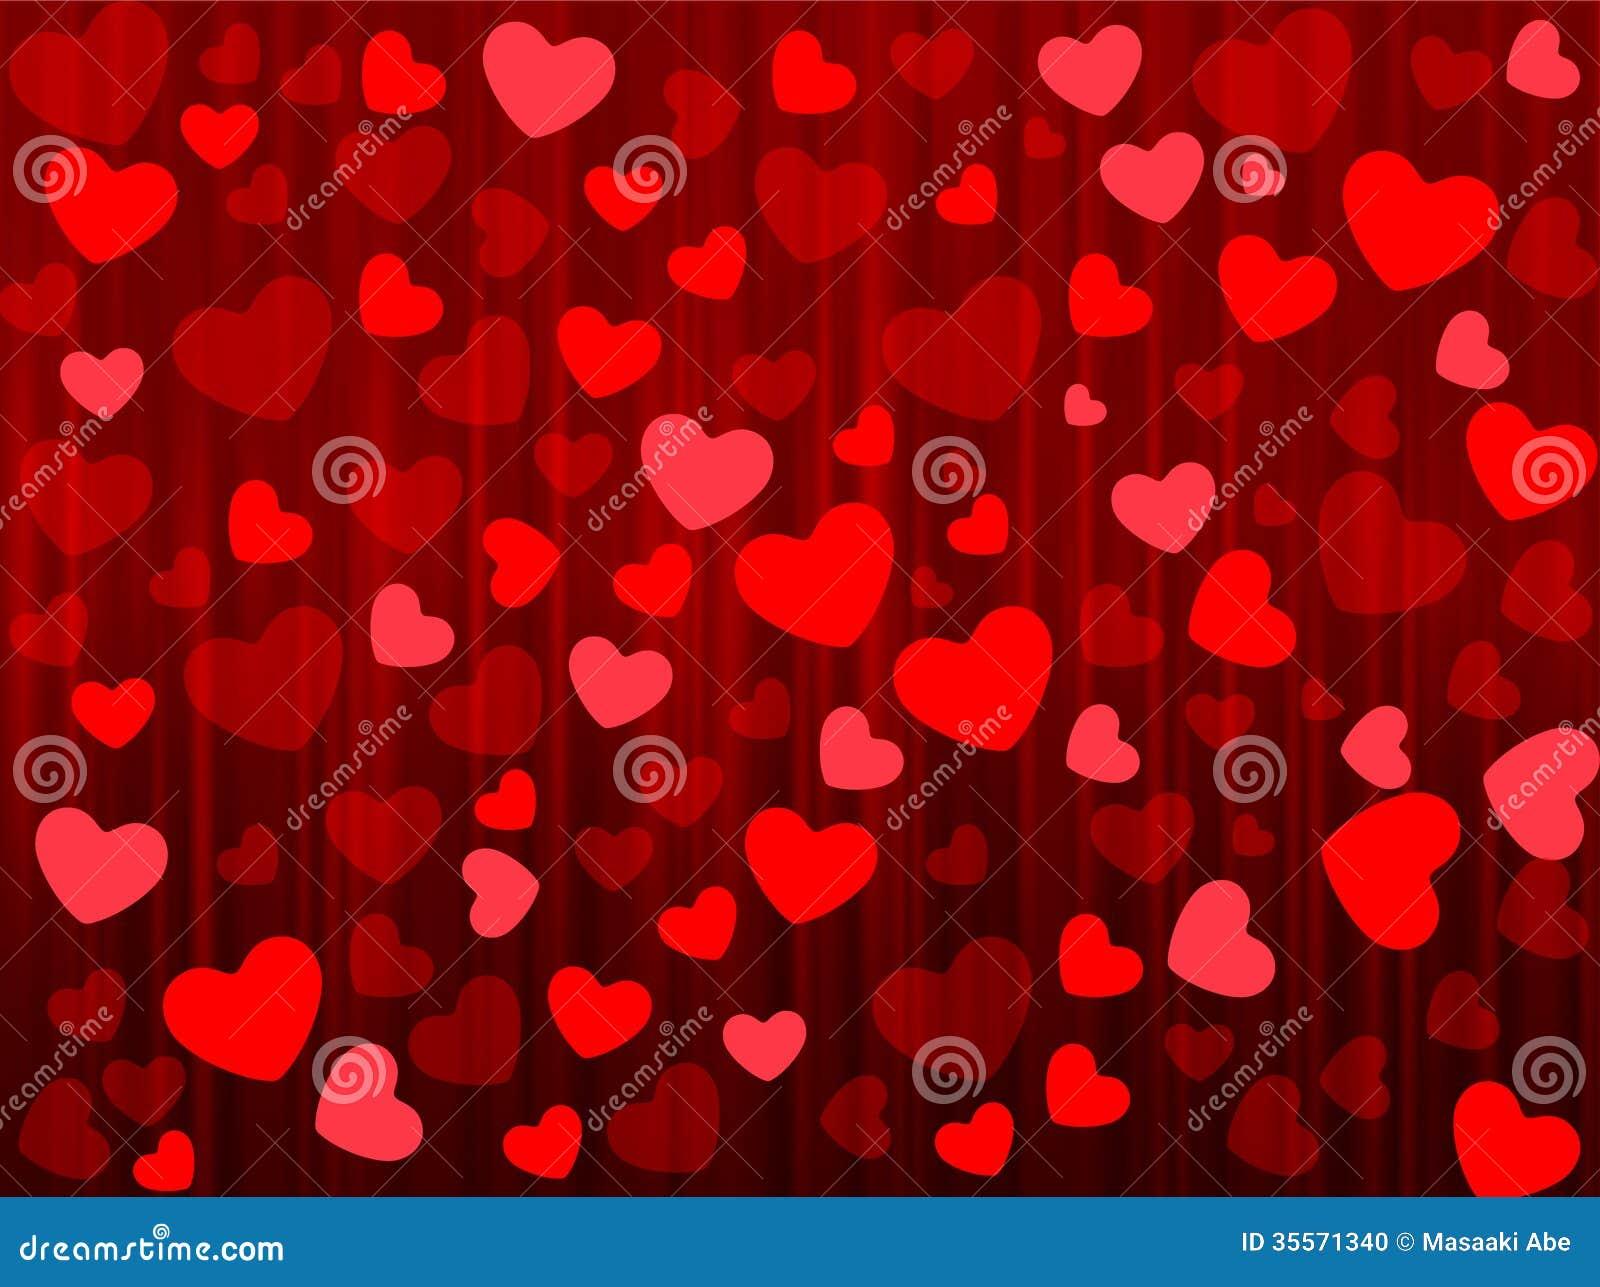 Heart Valentine Background Stock Photo - Image: 35571340